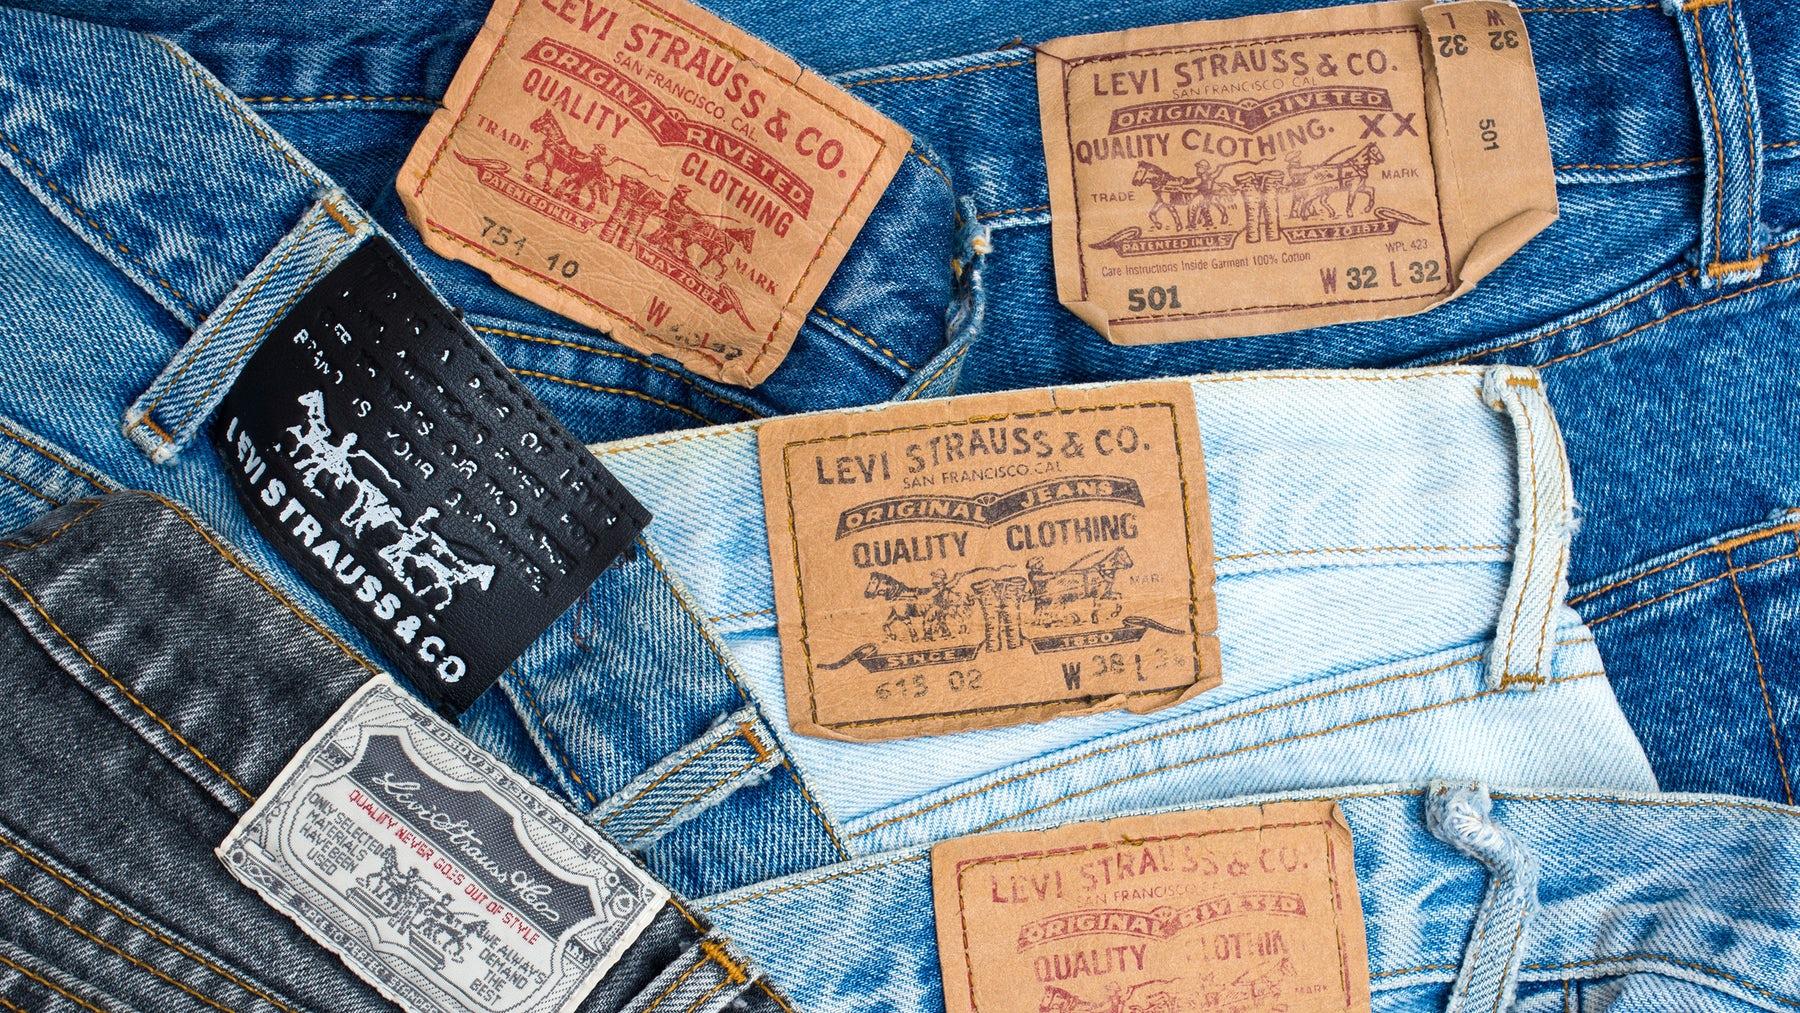 Levi's jeans | Source: Shutterstock